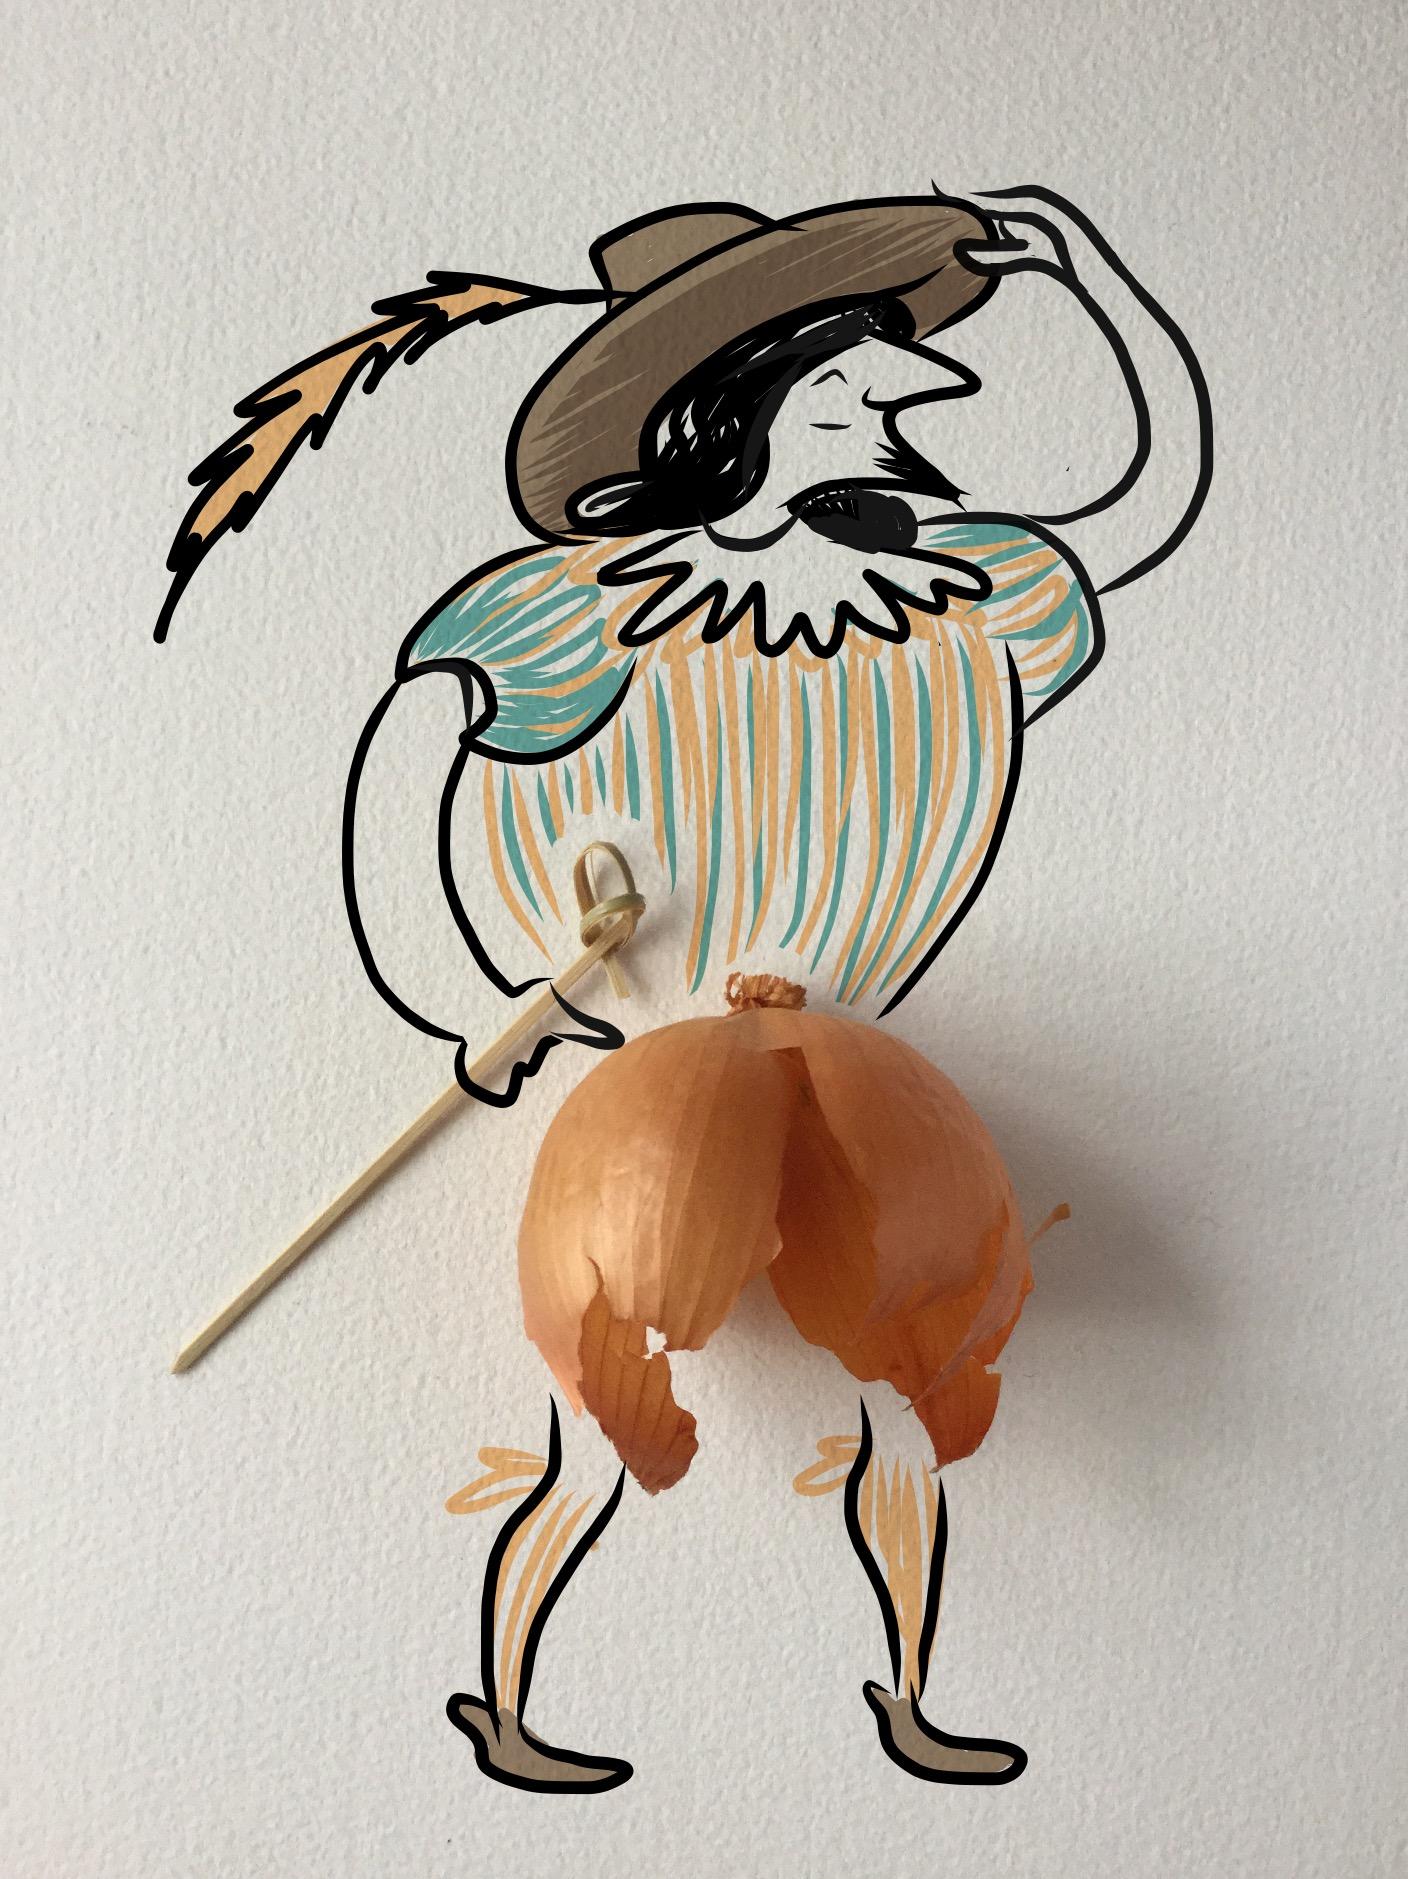 Sir Onion-Pants